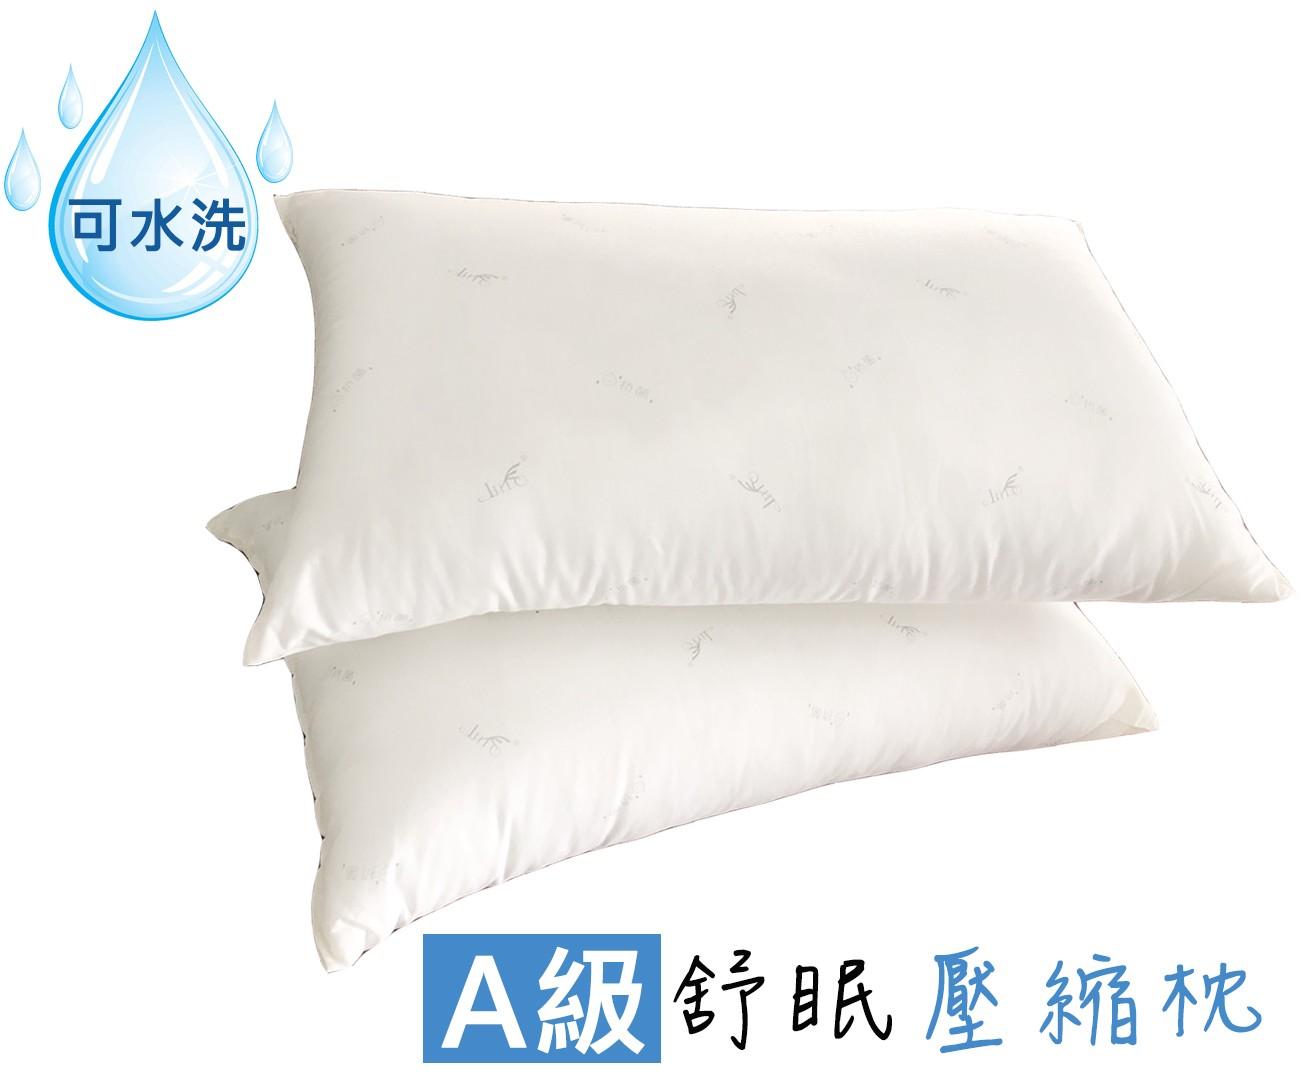 Ruehong(枕頭) -A級舒眠壓縮枕-枕心-一組2入